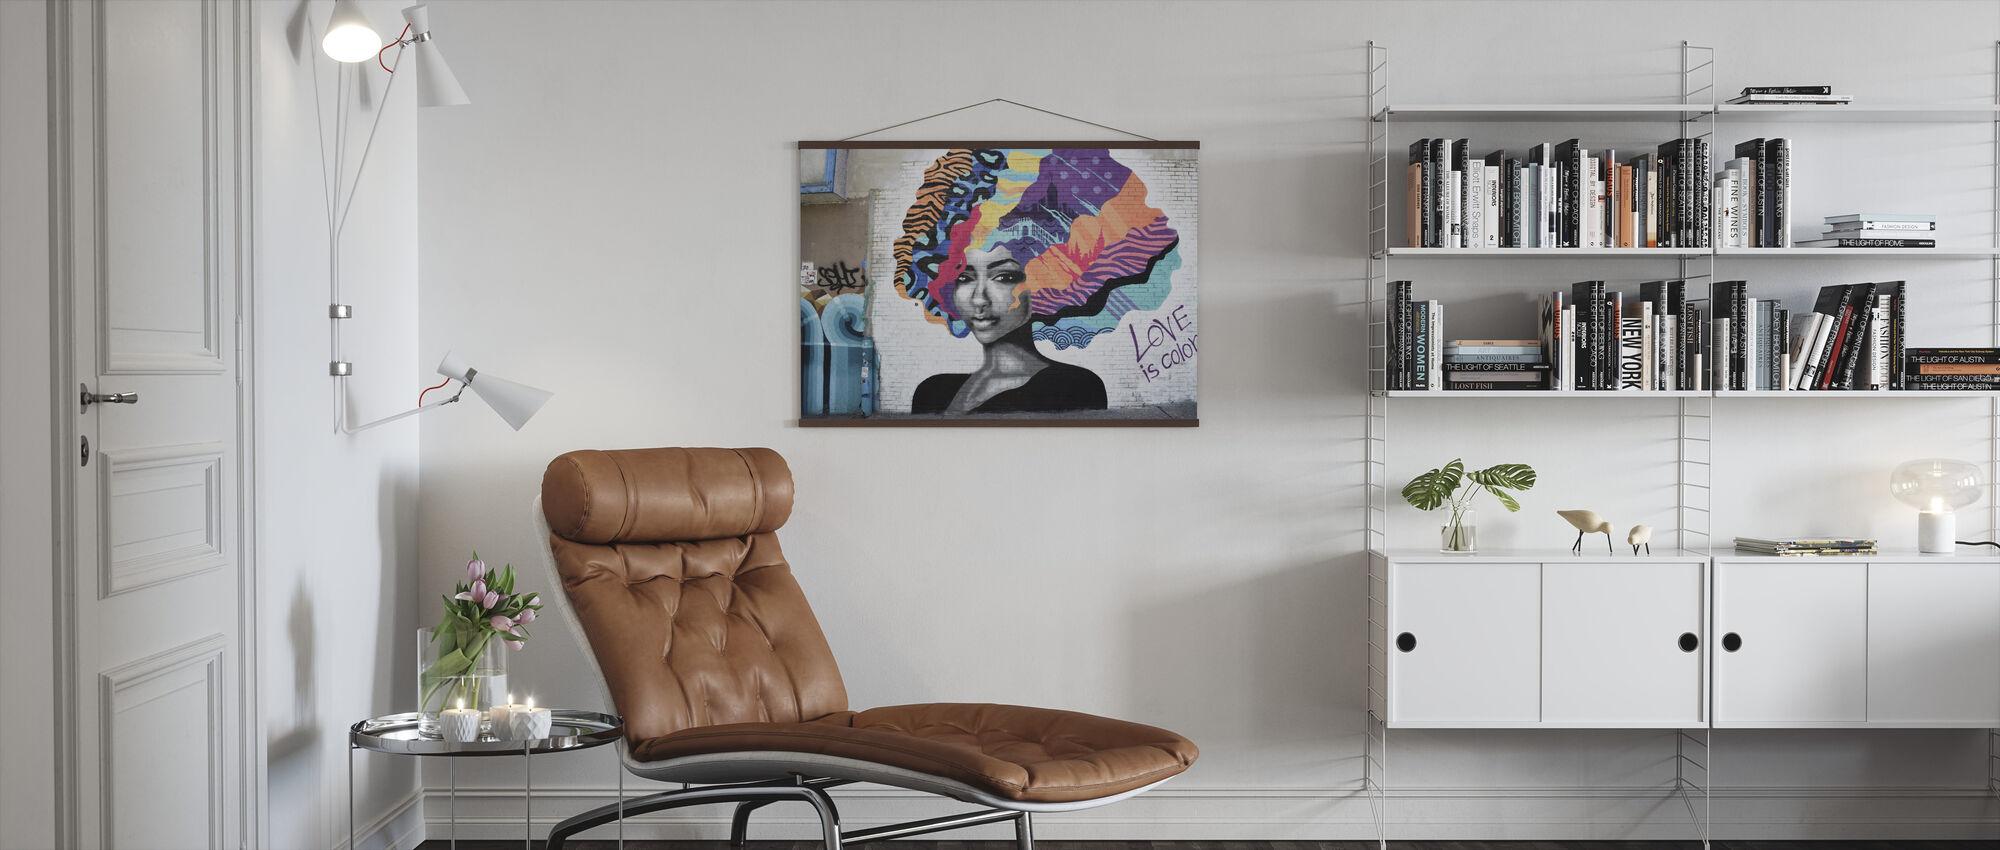 Woman Graffiti - Poster - Living Room